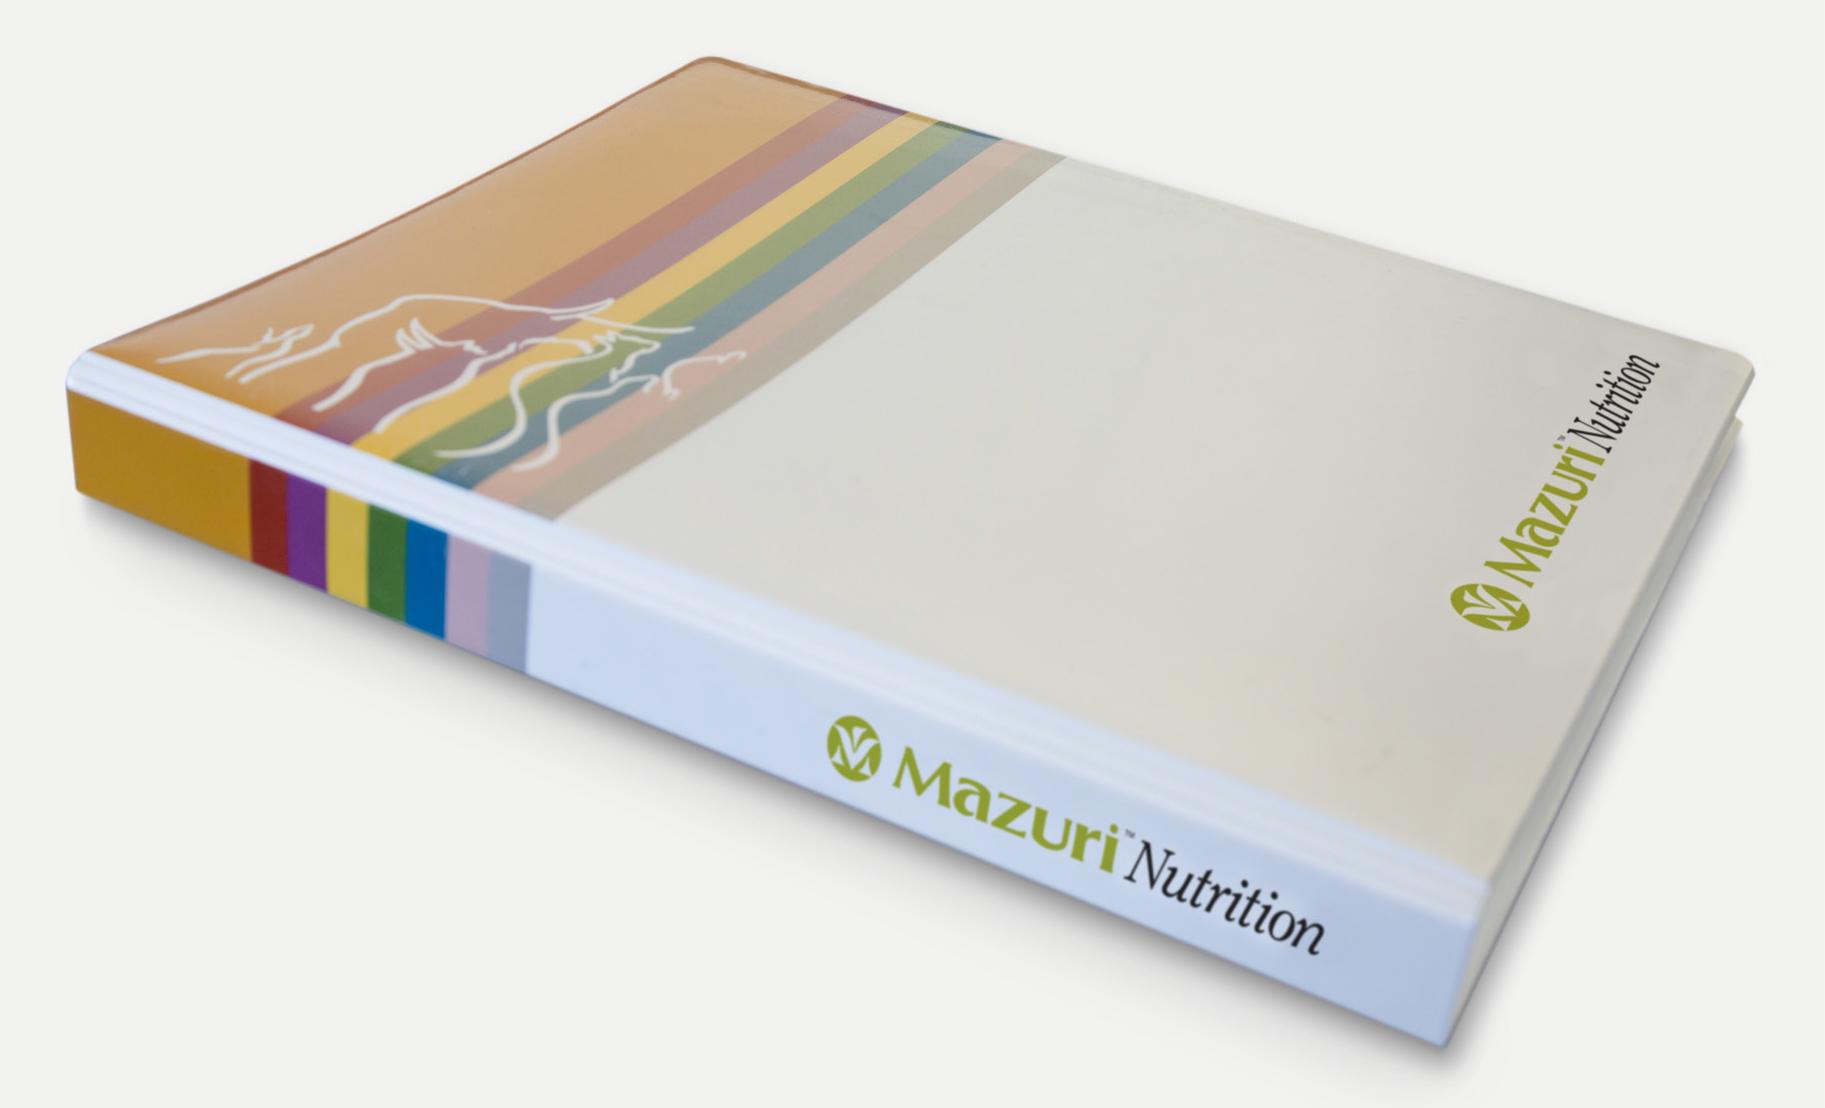 MAZURI-PROJECT-PAGE-PR_07